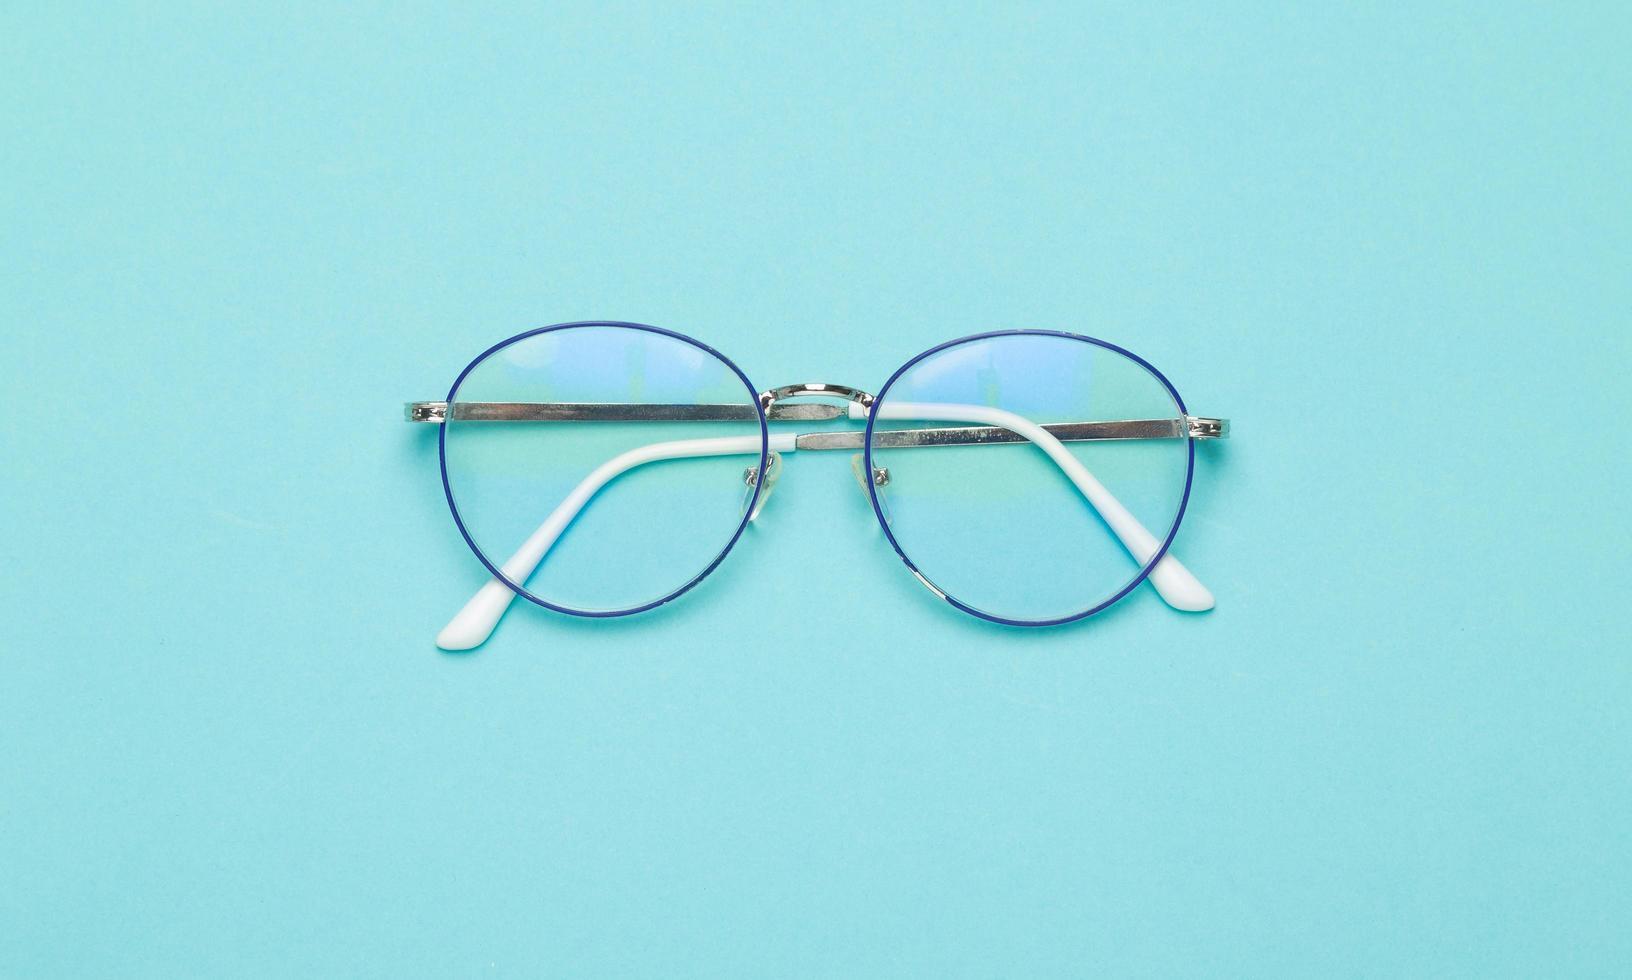 glasögon på blå bakgrund foto